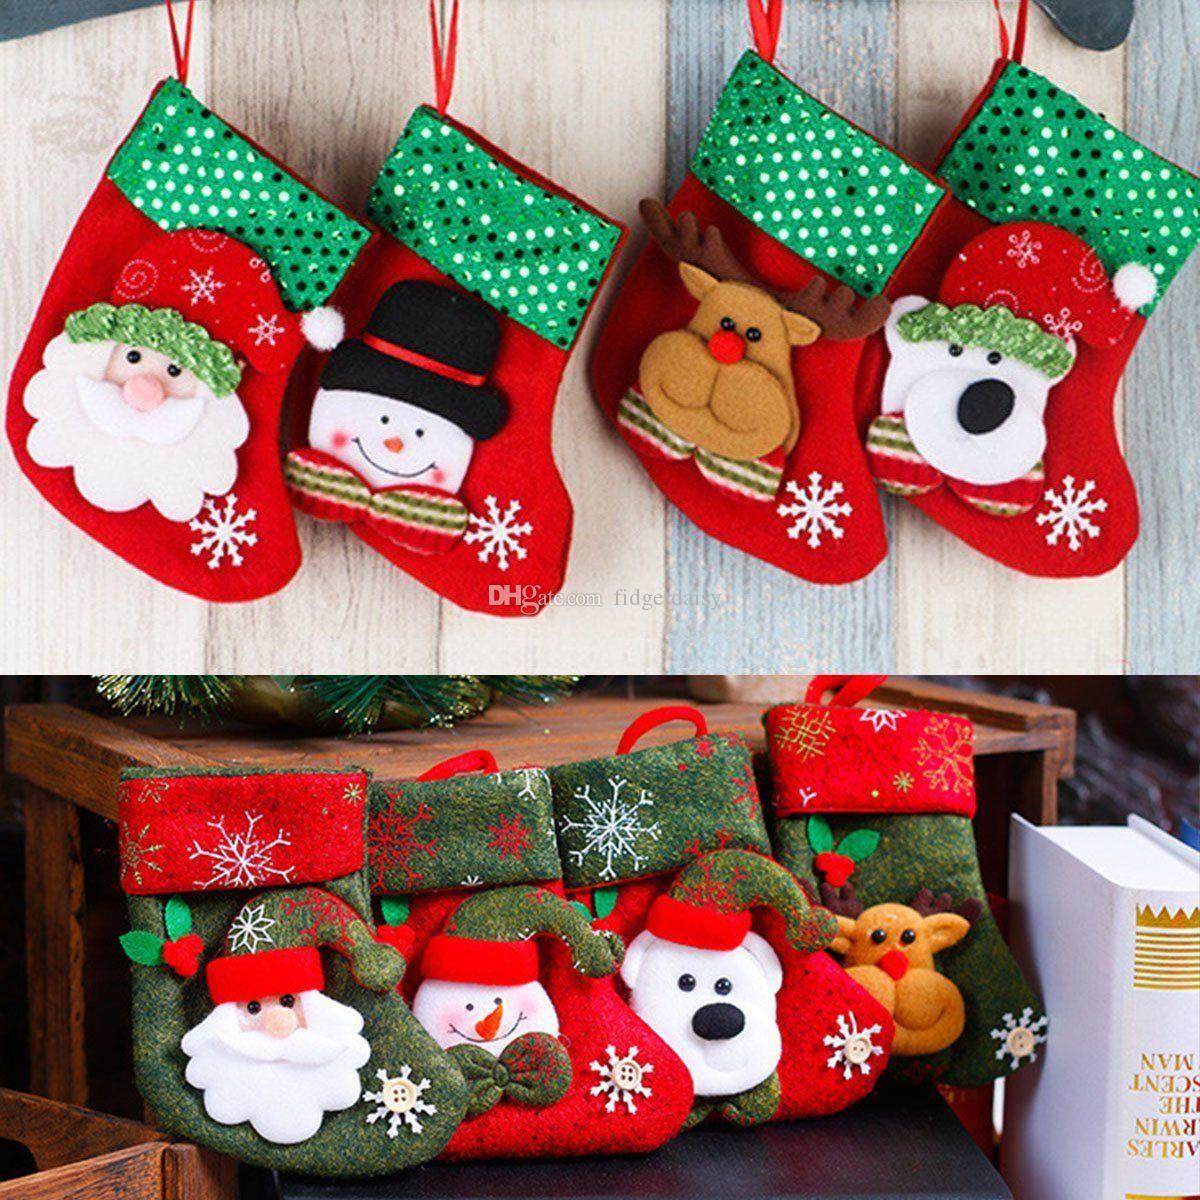 2017 christmas stocking sequin socks gifts sacks candy bags cartoon stockings christmas tree decor santa claus snowman elk bear hot sale christmas - Where To Buy Christmas Stockings